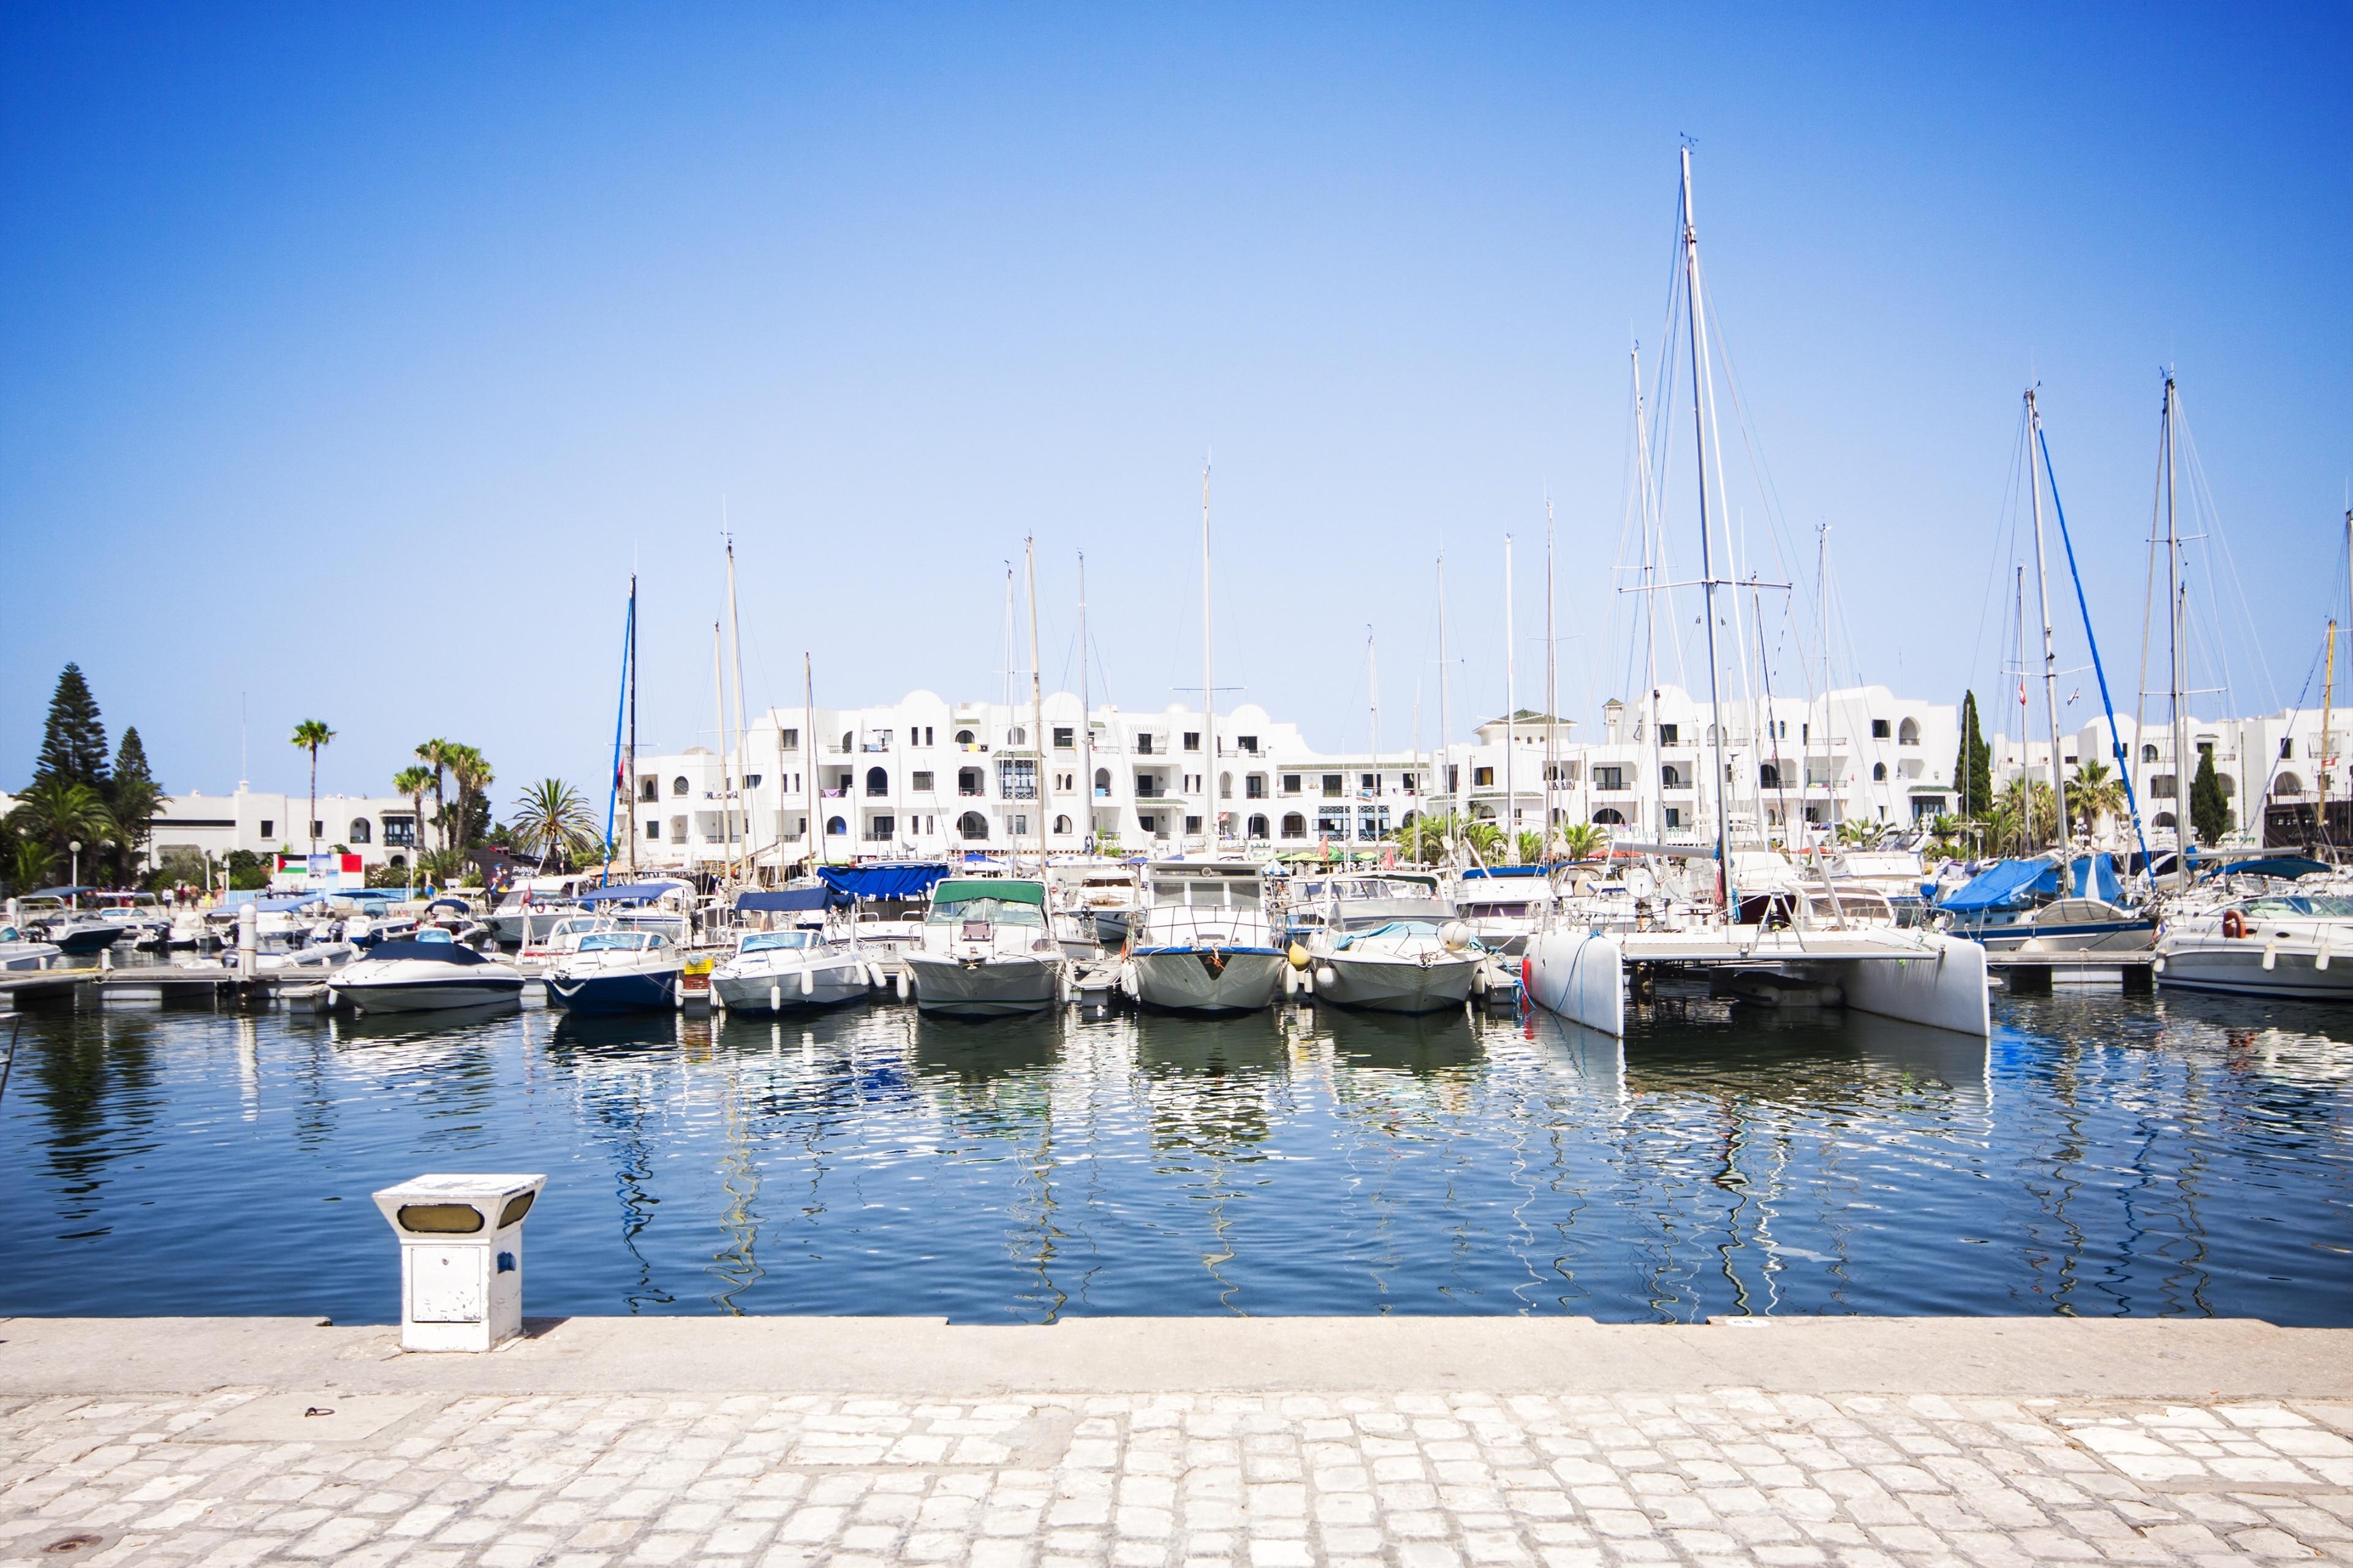 Port El Kantaoui, Sousse Governorate, Tunisia